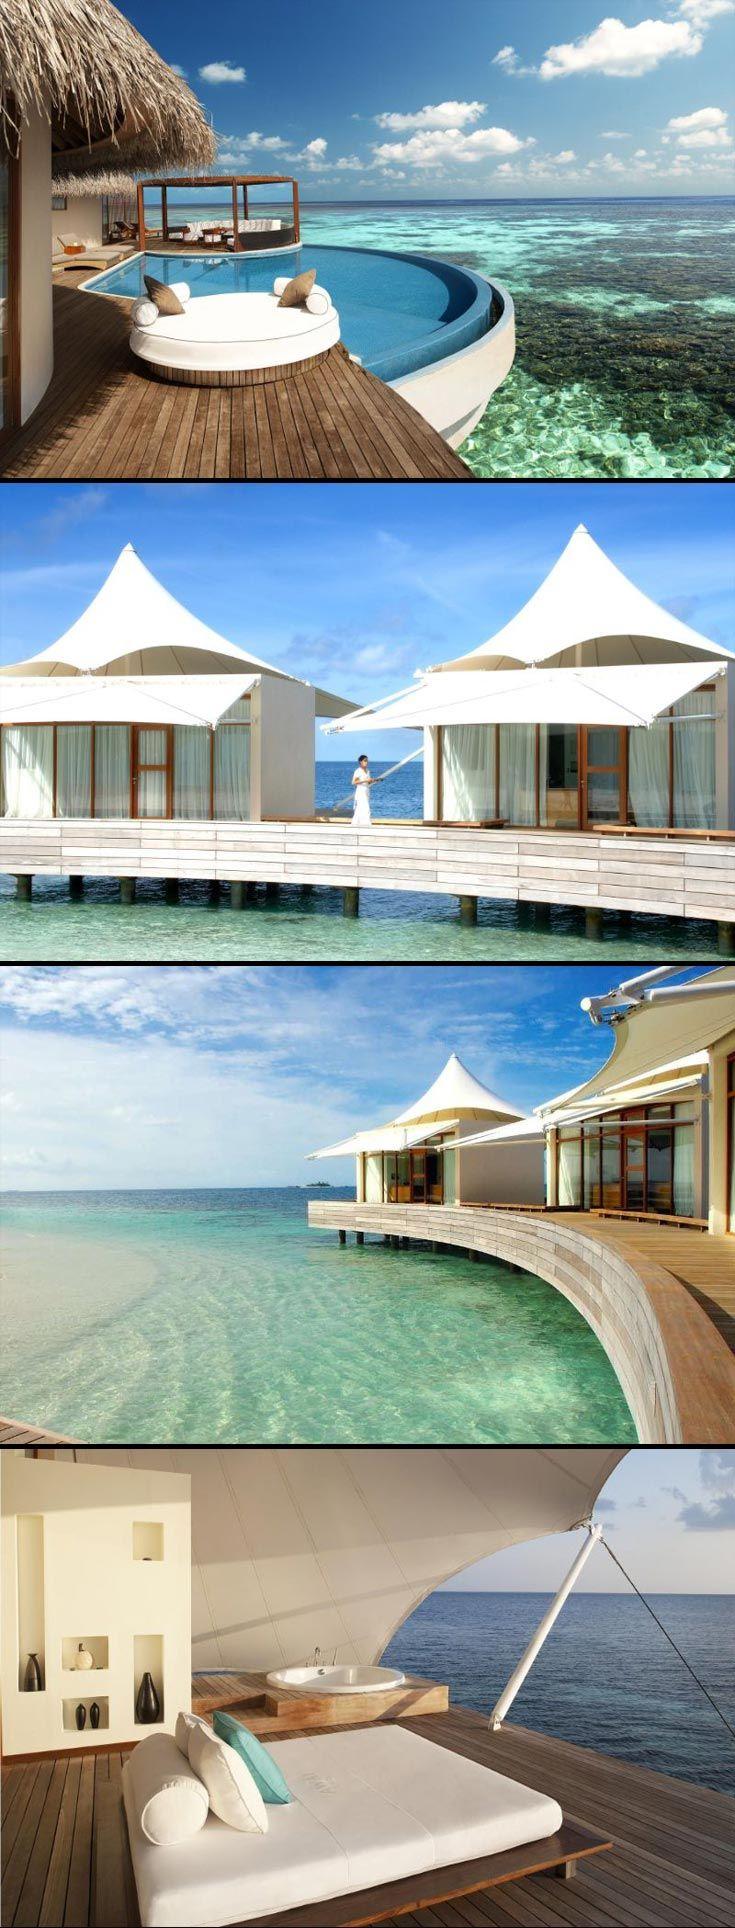 Top 10 Honeymoon Resorts In The Maldives